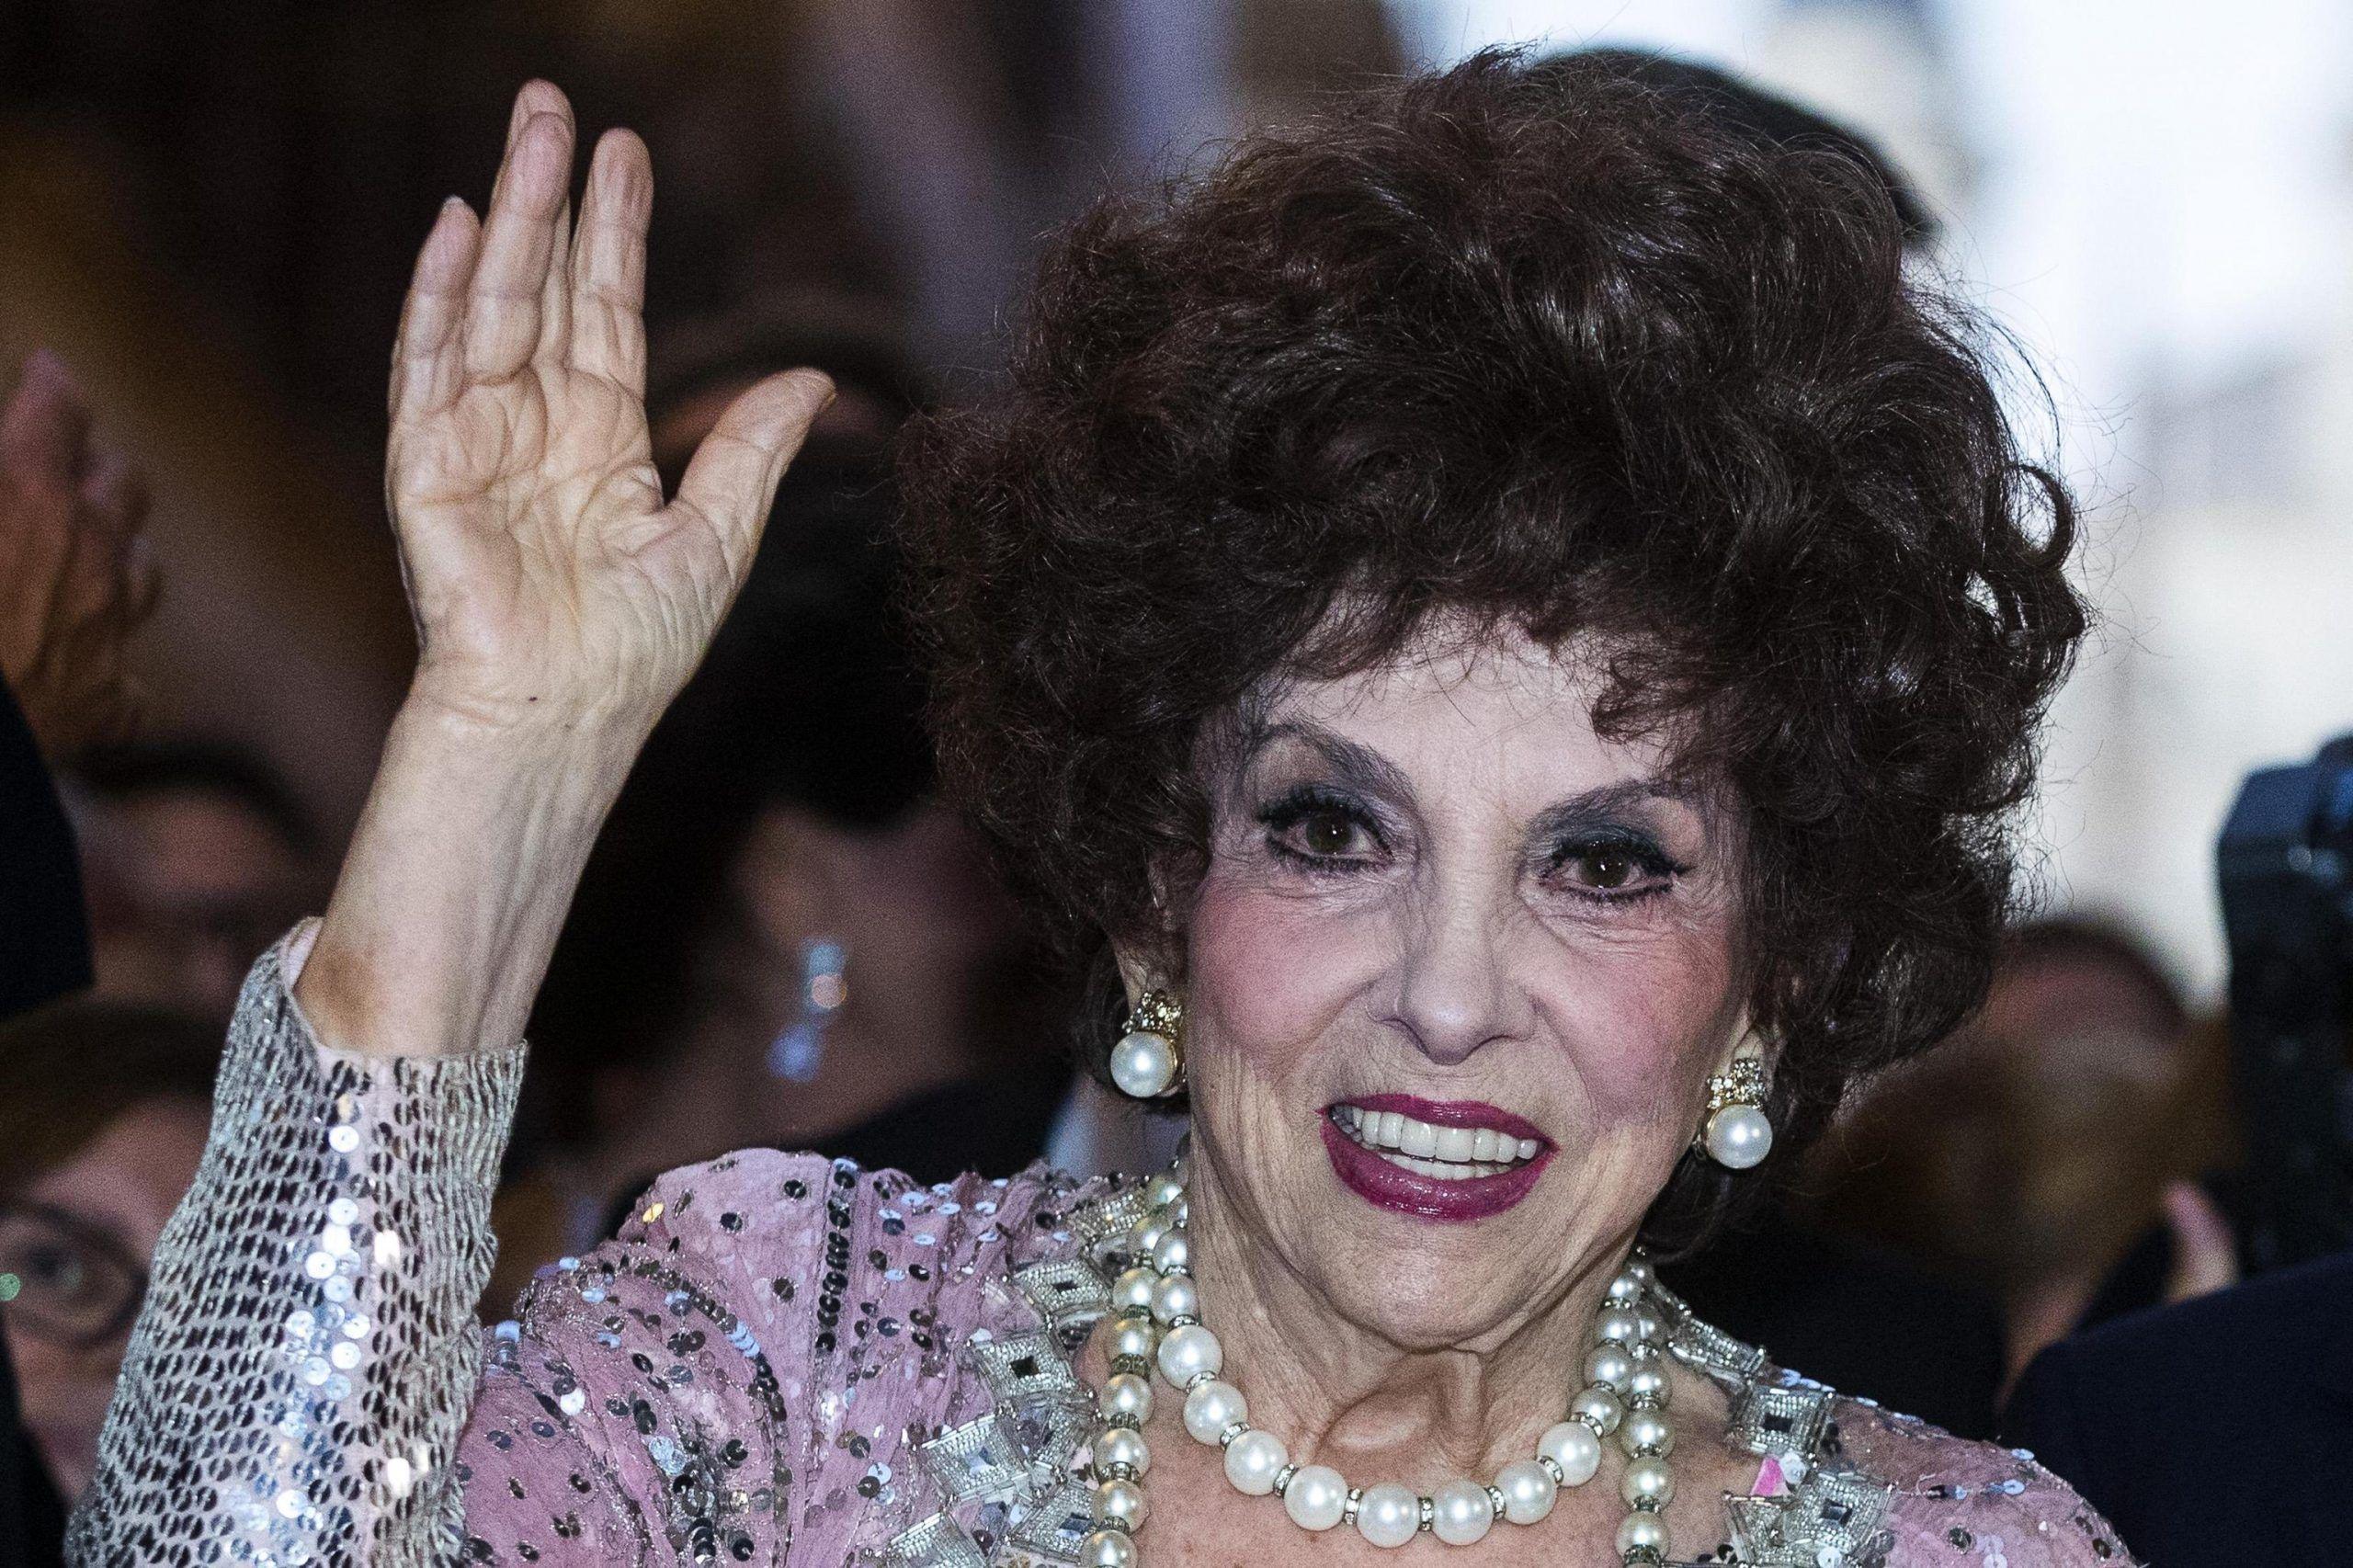 Gina Lollobrigida turns 90